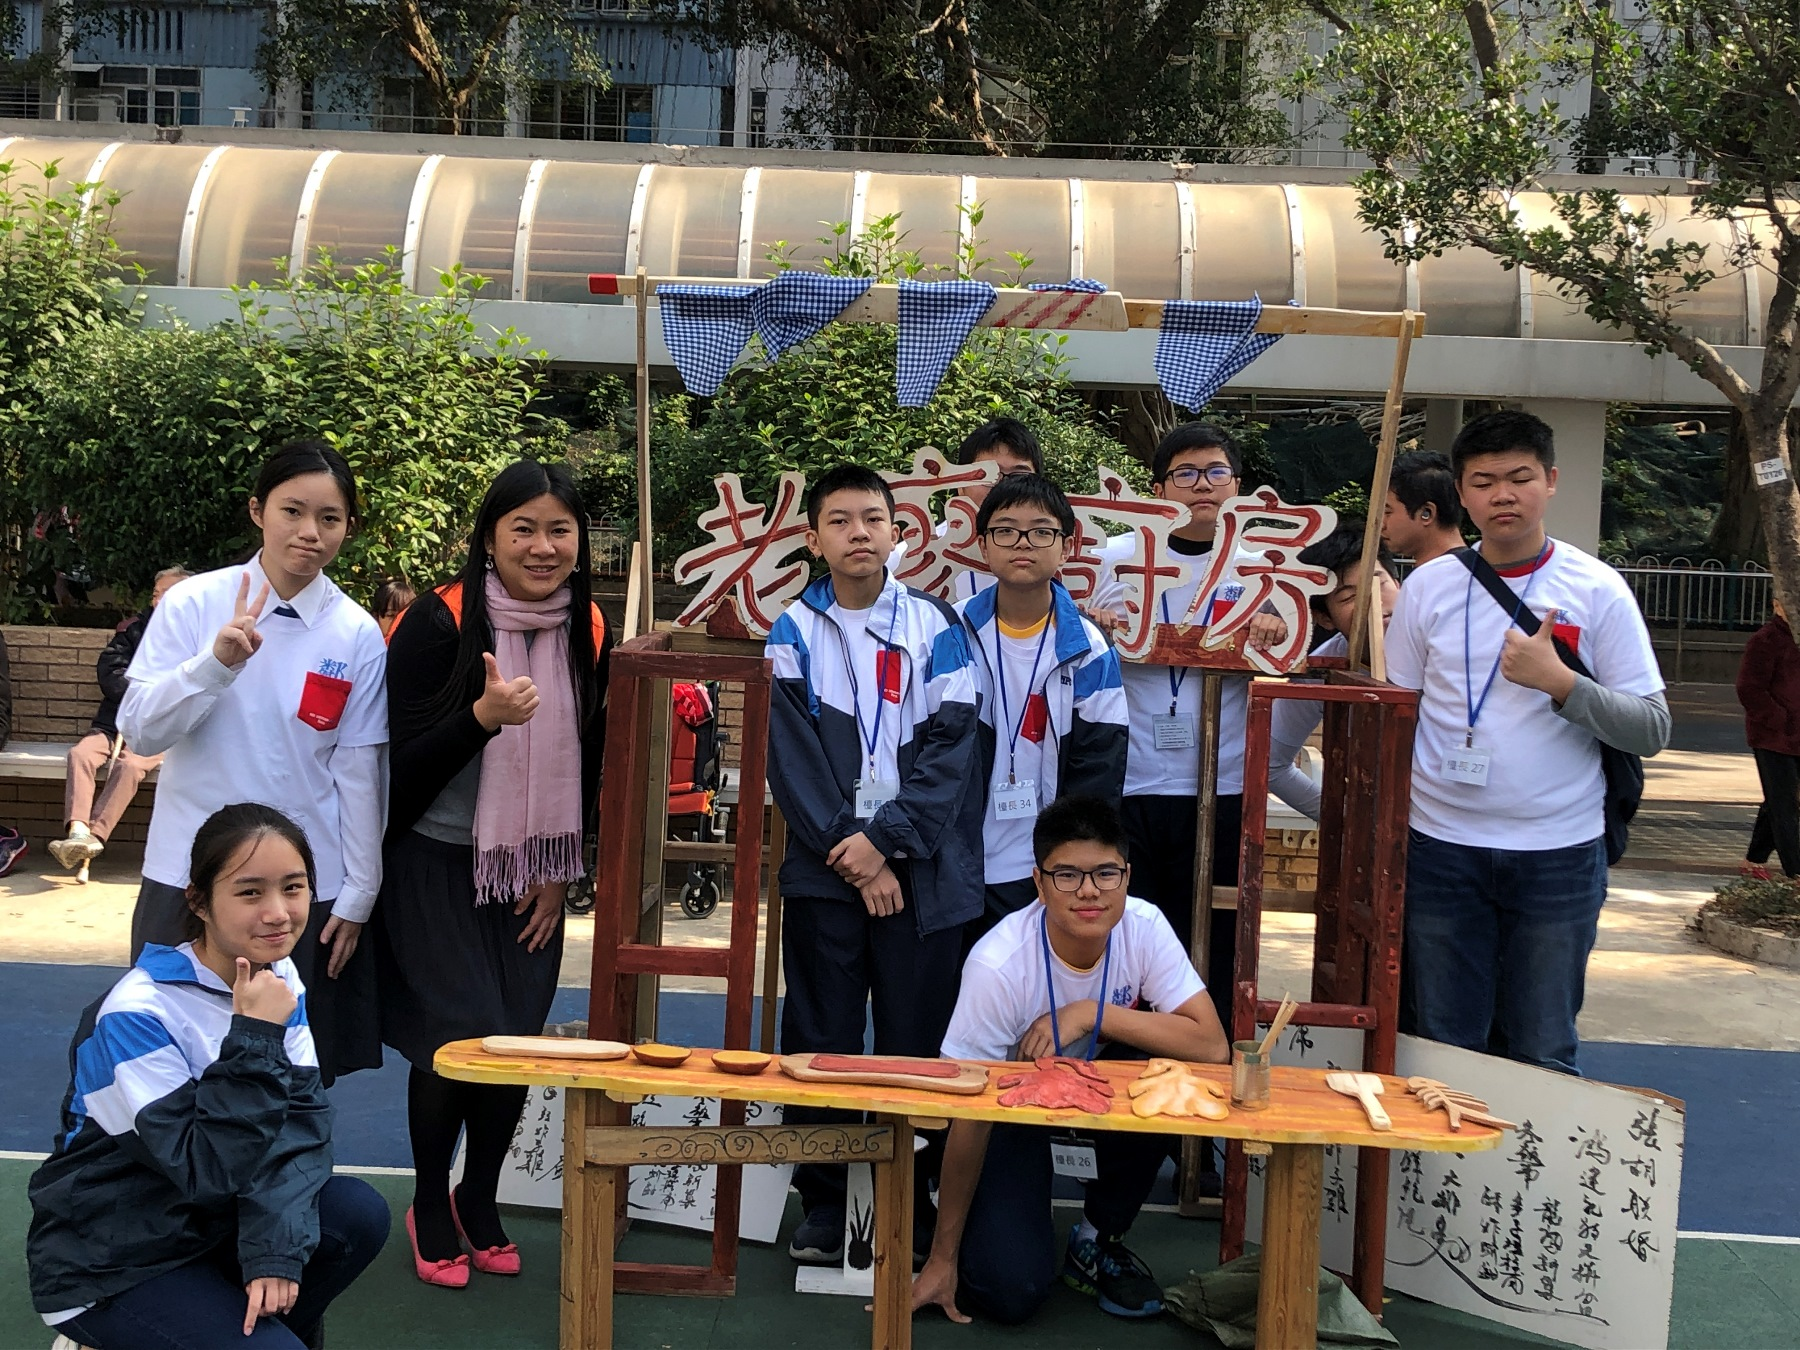 http://npc.edu.hk/sites/default/files/img_2153.jpg